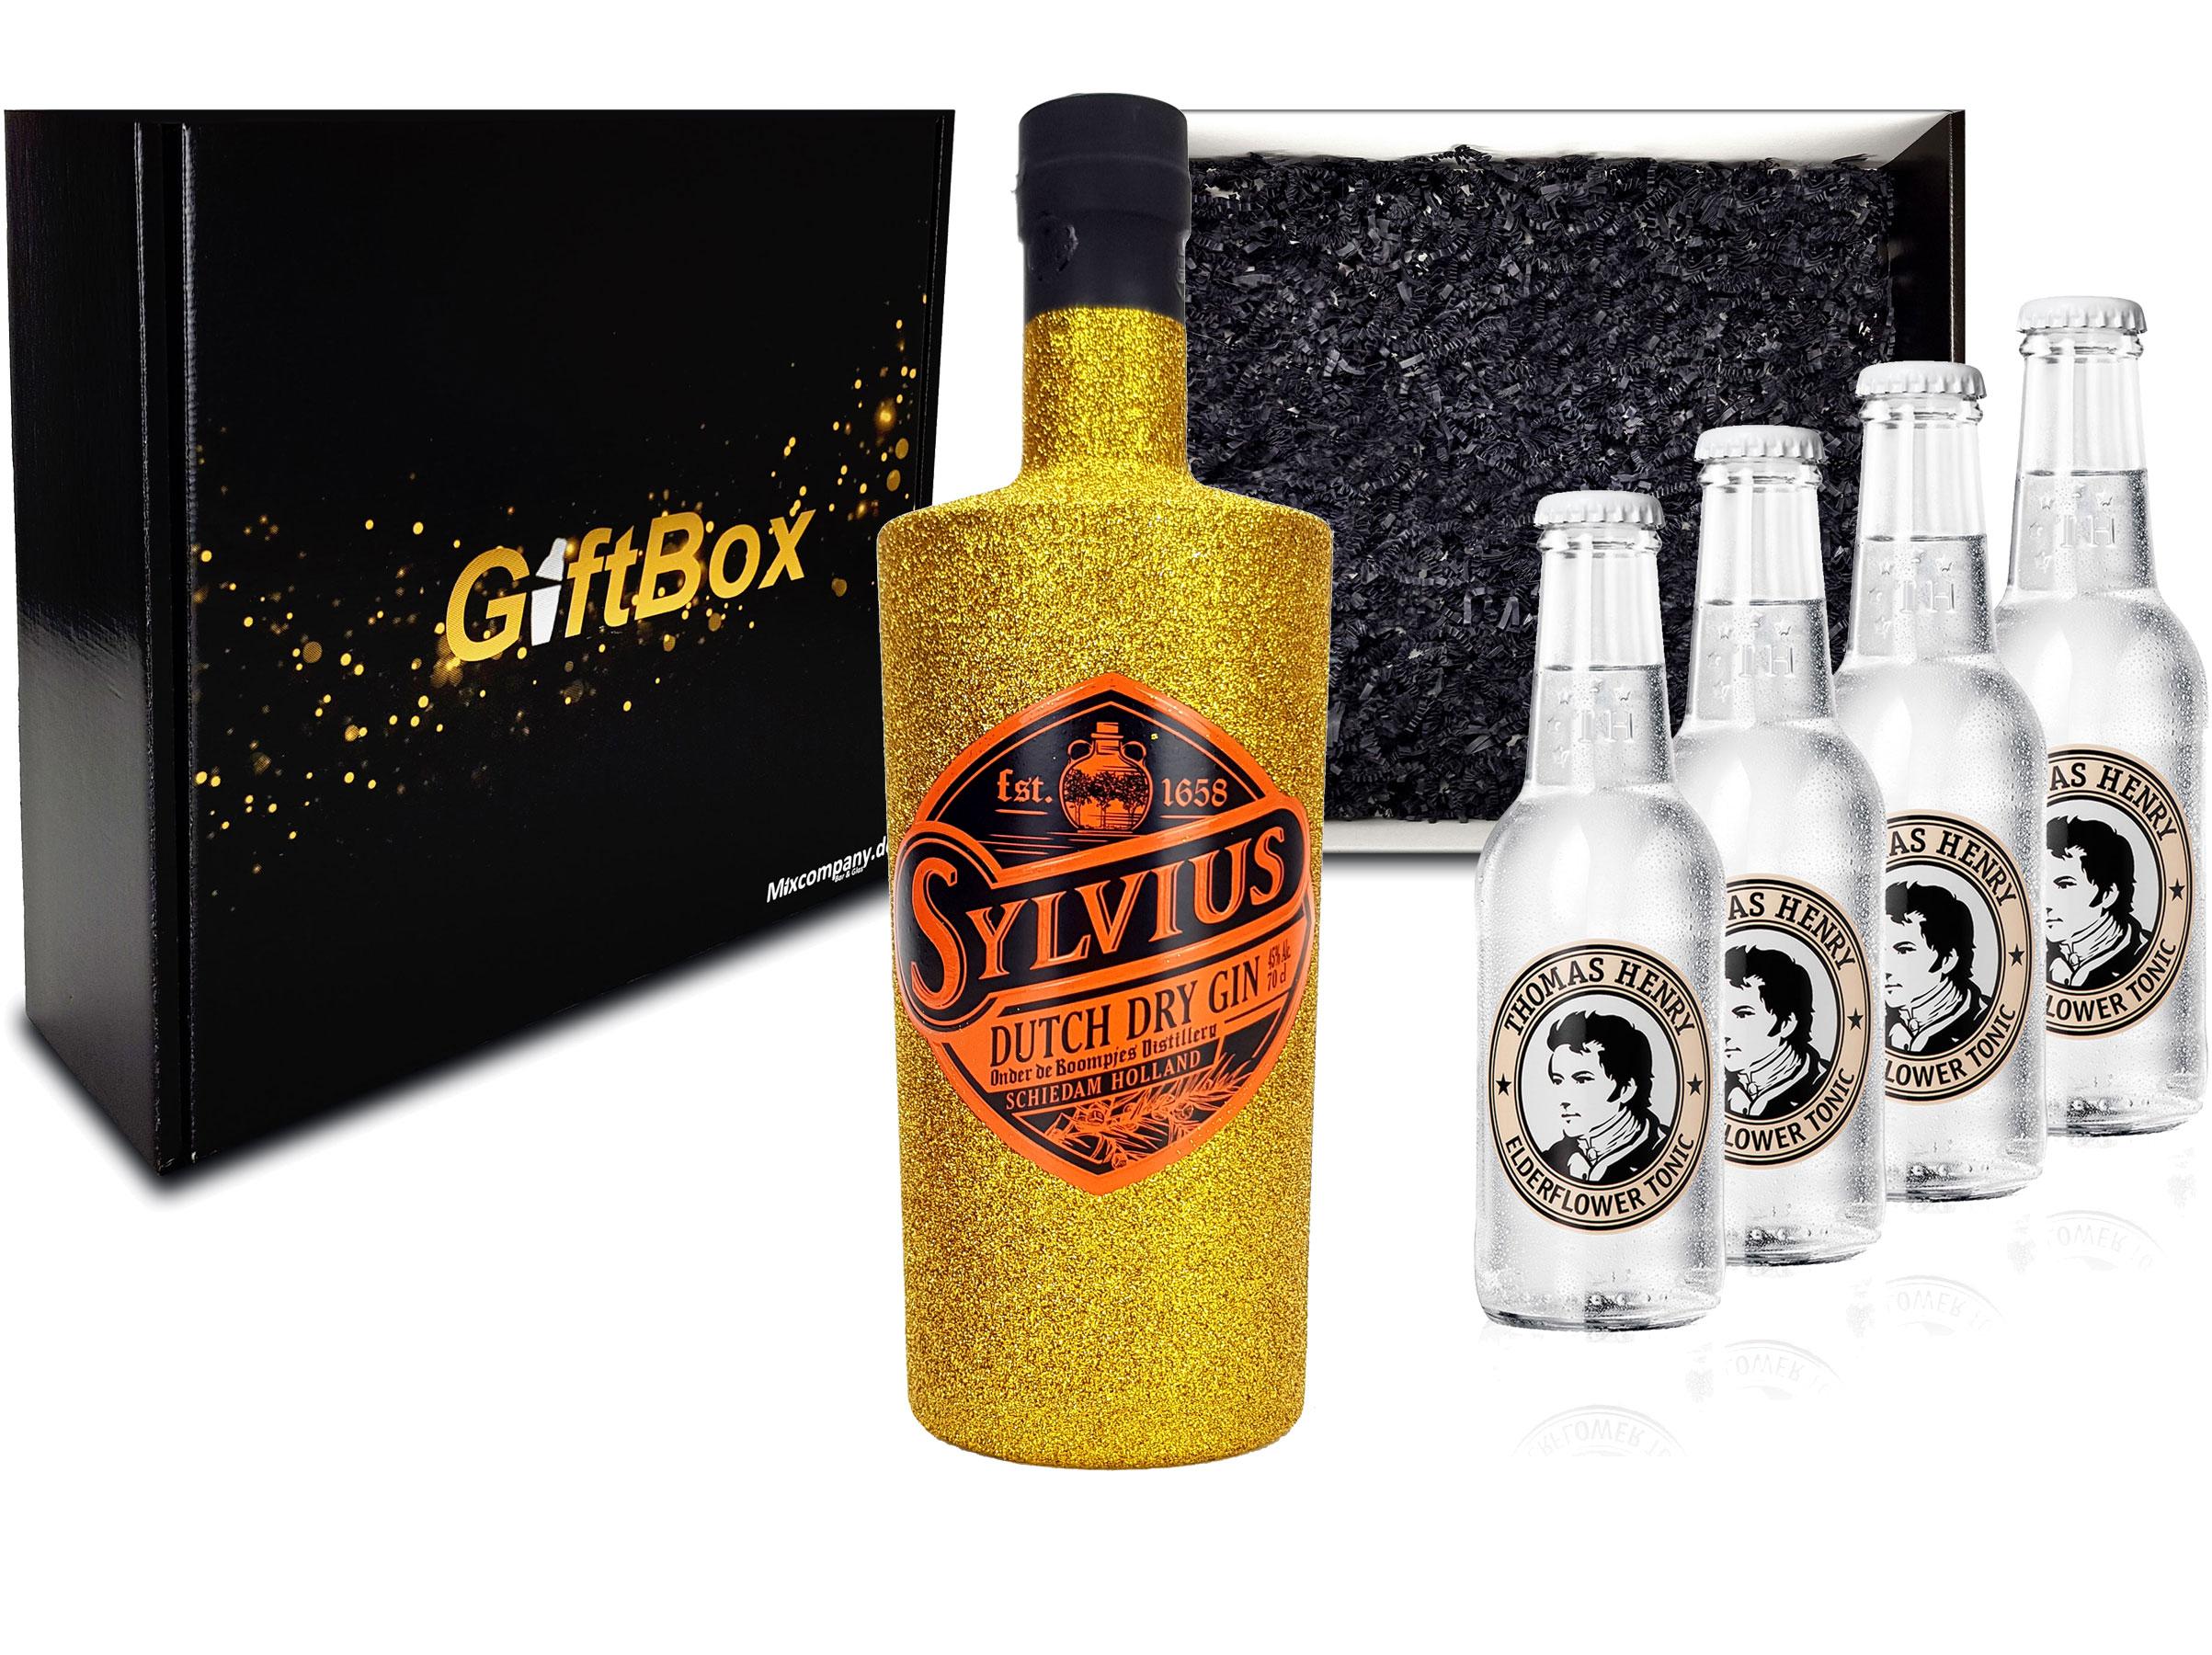 Gin Tonic Bling Bling Gold Glitzer Set Giftbox Geschenkset - Sylvius Dutch Gin 0,7l 700ml (45% Vol) + 4x Thomas Henry Elderflower Tonic Water 200ml inkl. Pfand MEHRWEG -[Enthält Sulfite]